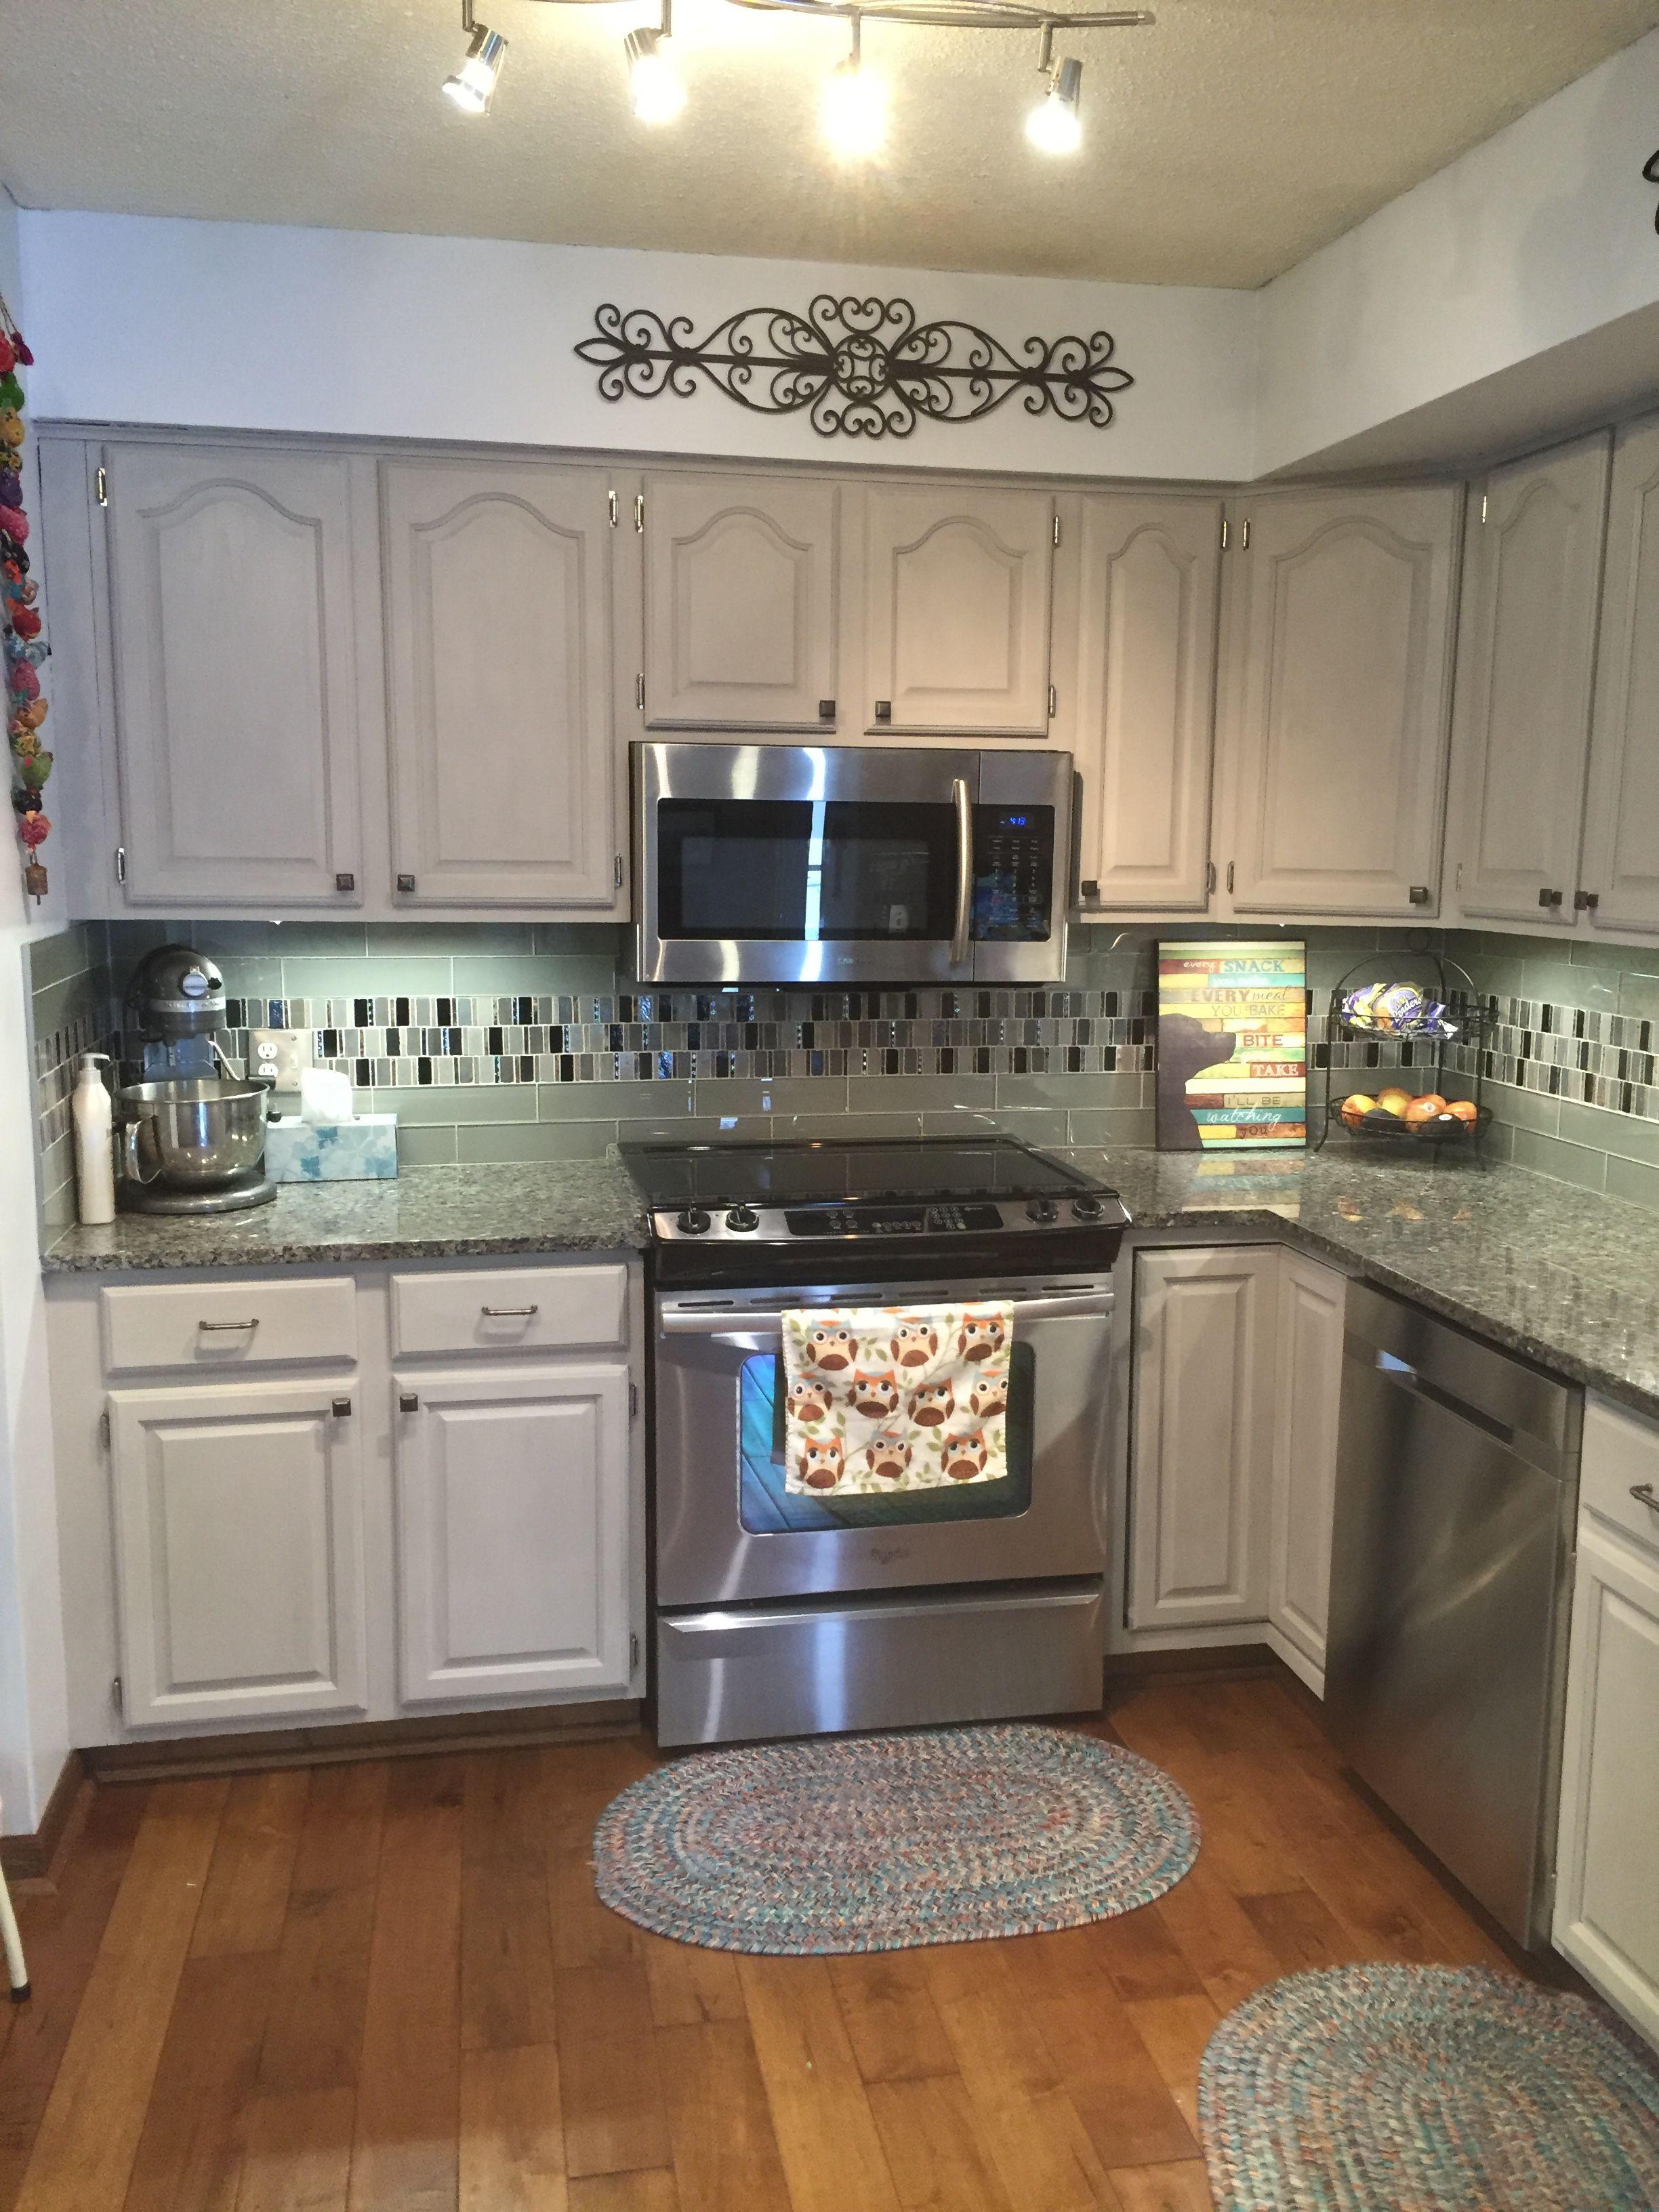 Kitchen cabinets- ASCP Pure White/French Linen | Kitchen ...